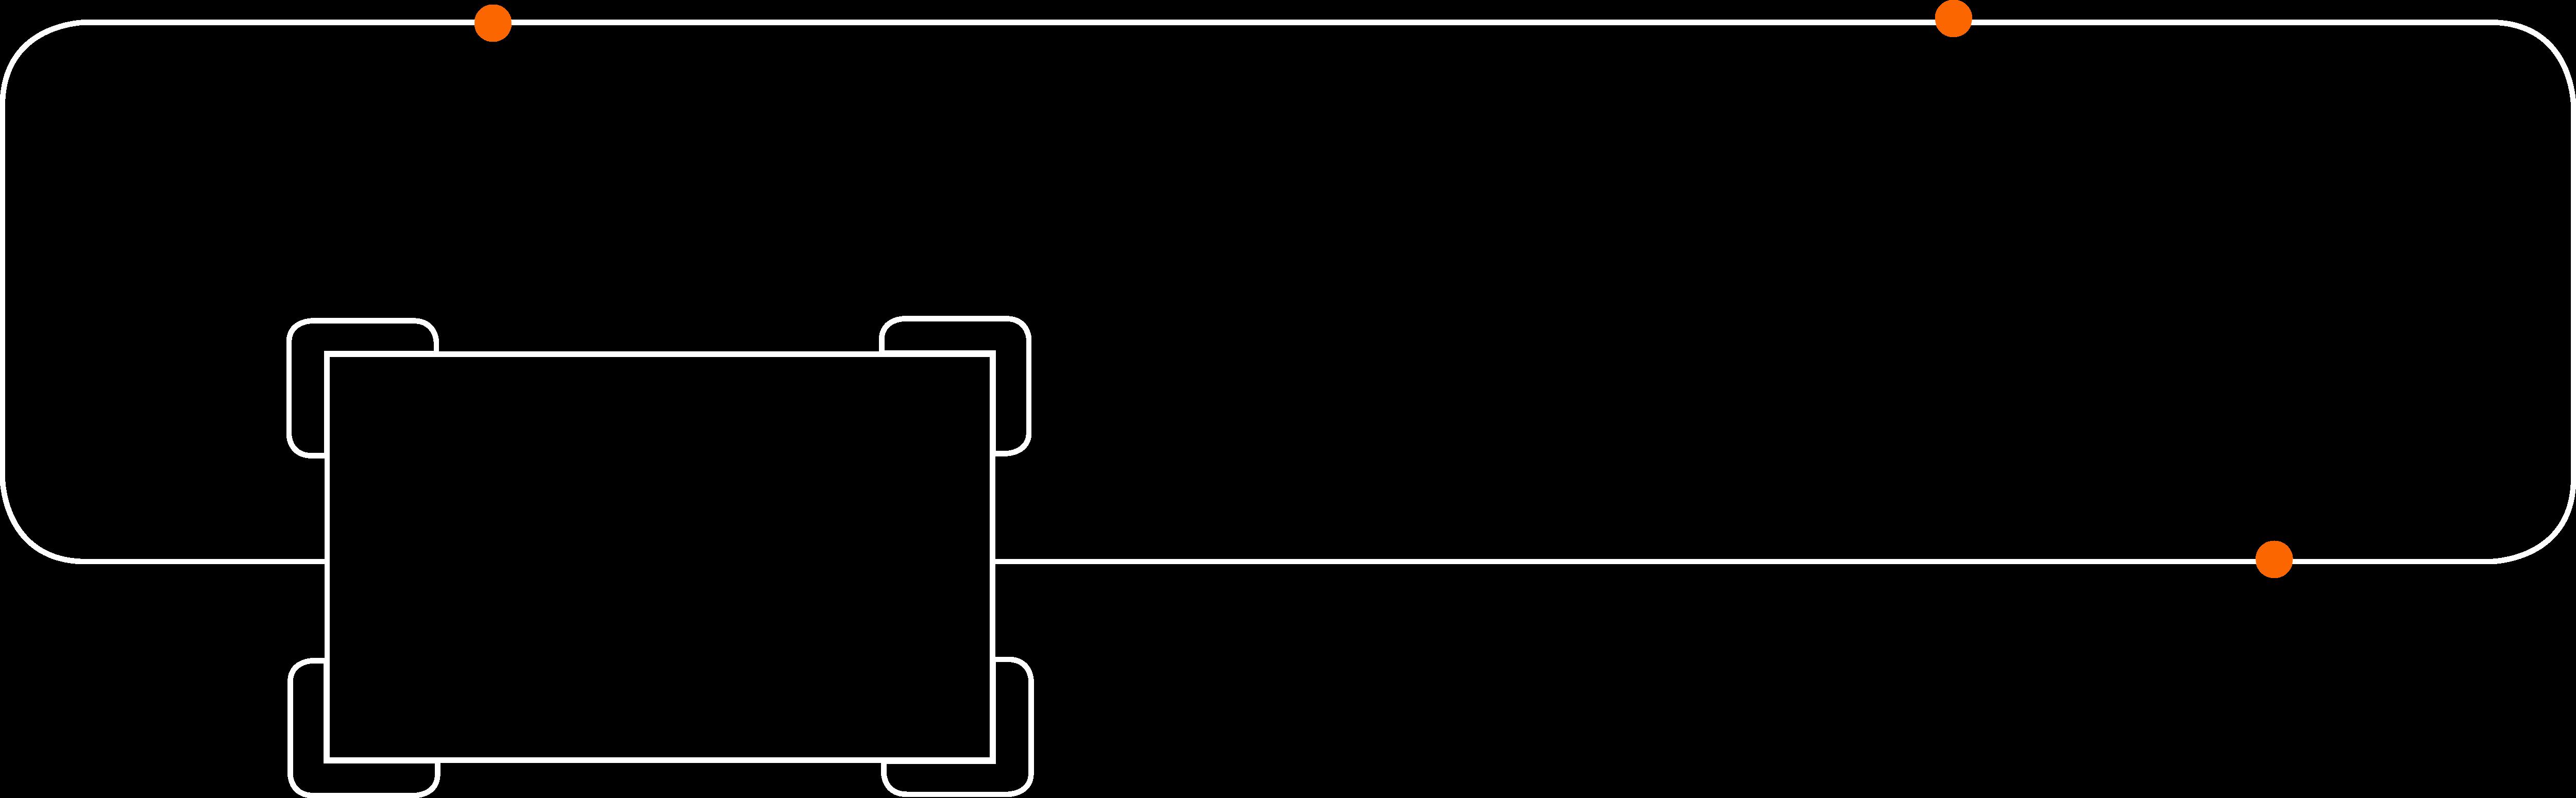 eQart Navigation Loop